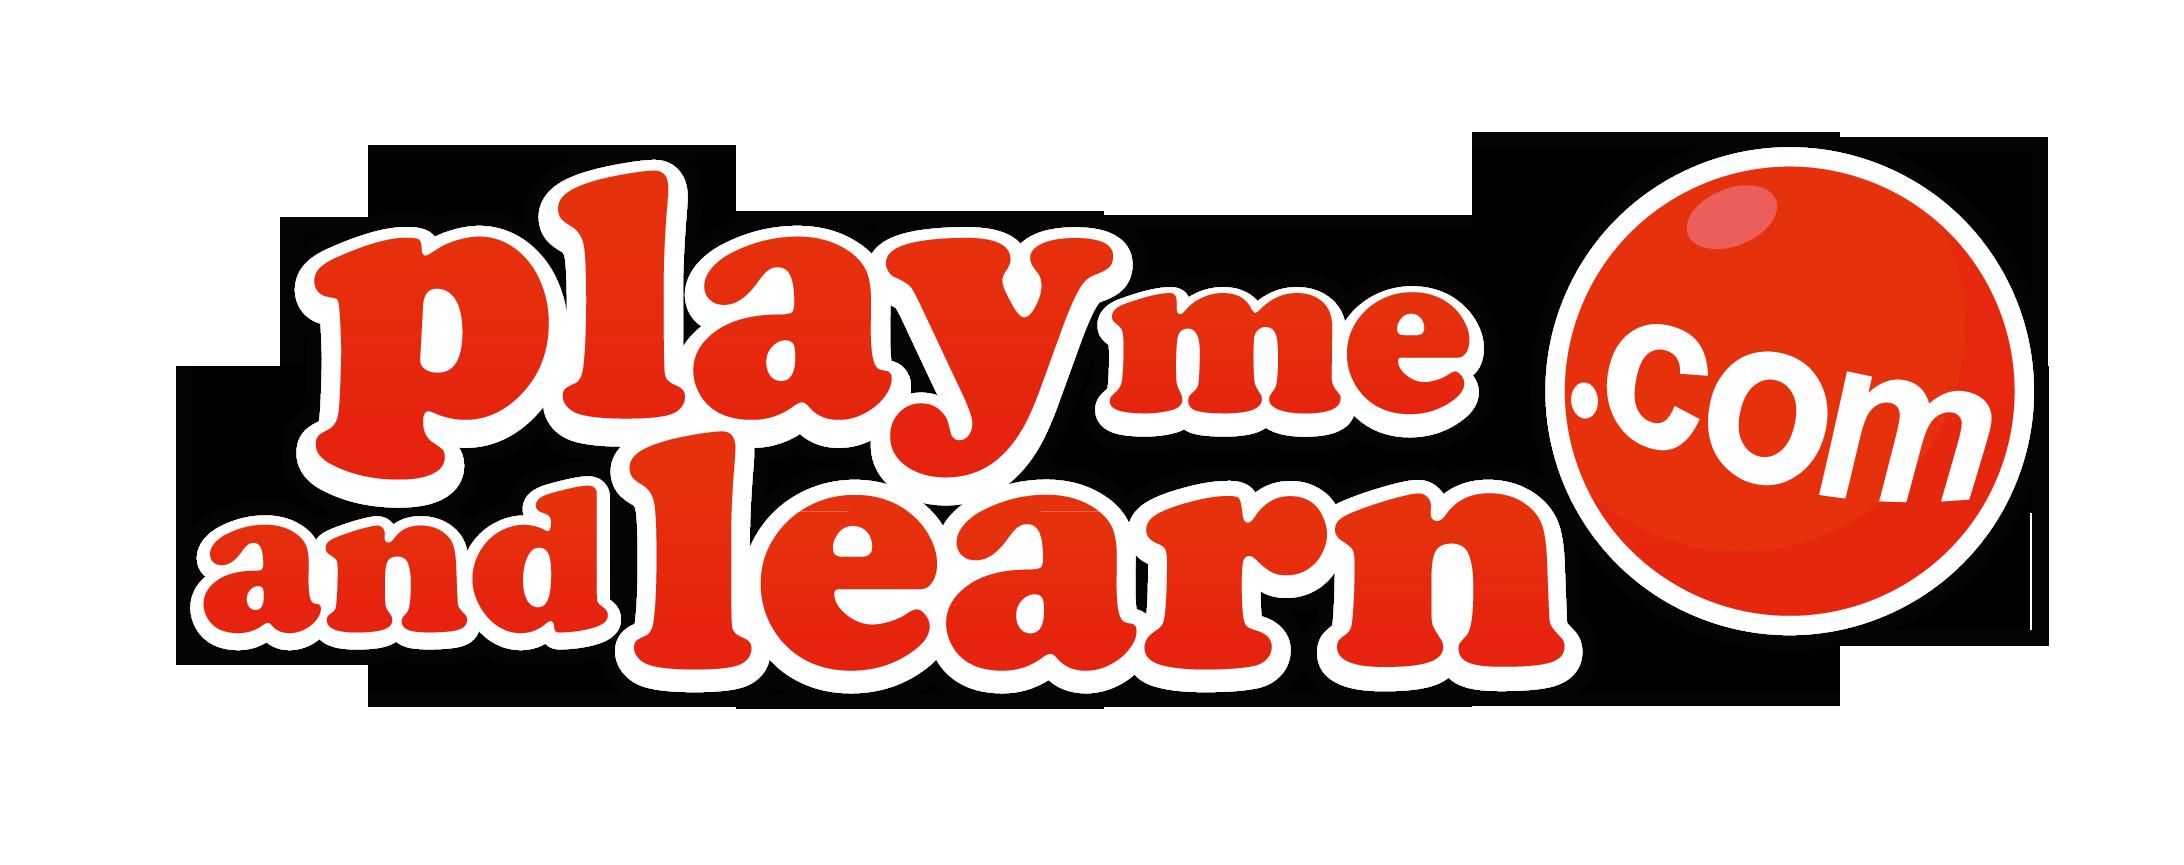 playmeandlearn.com - logo